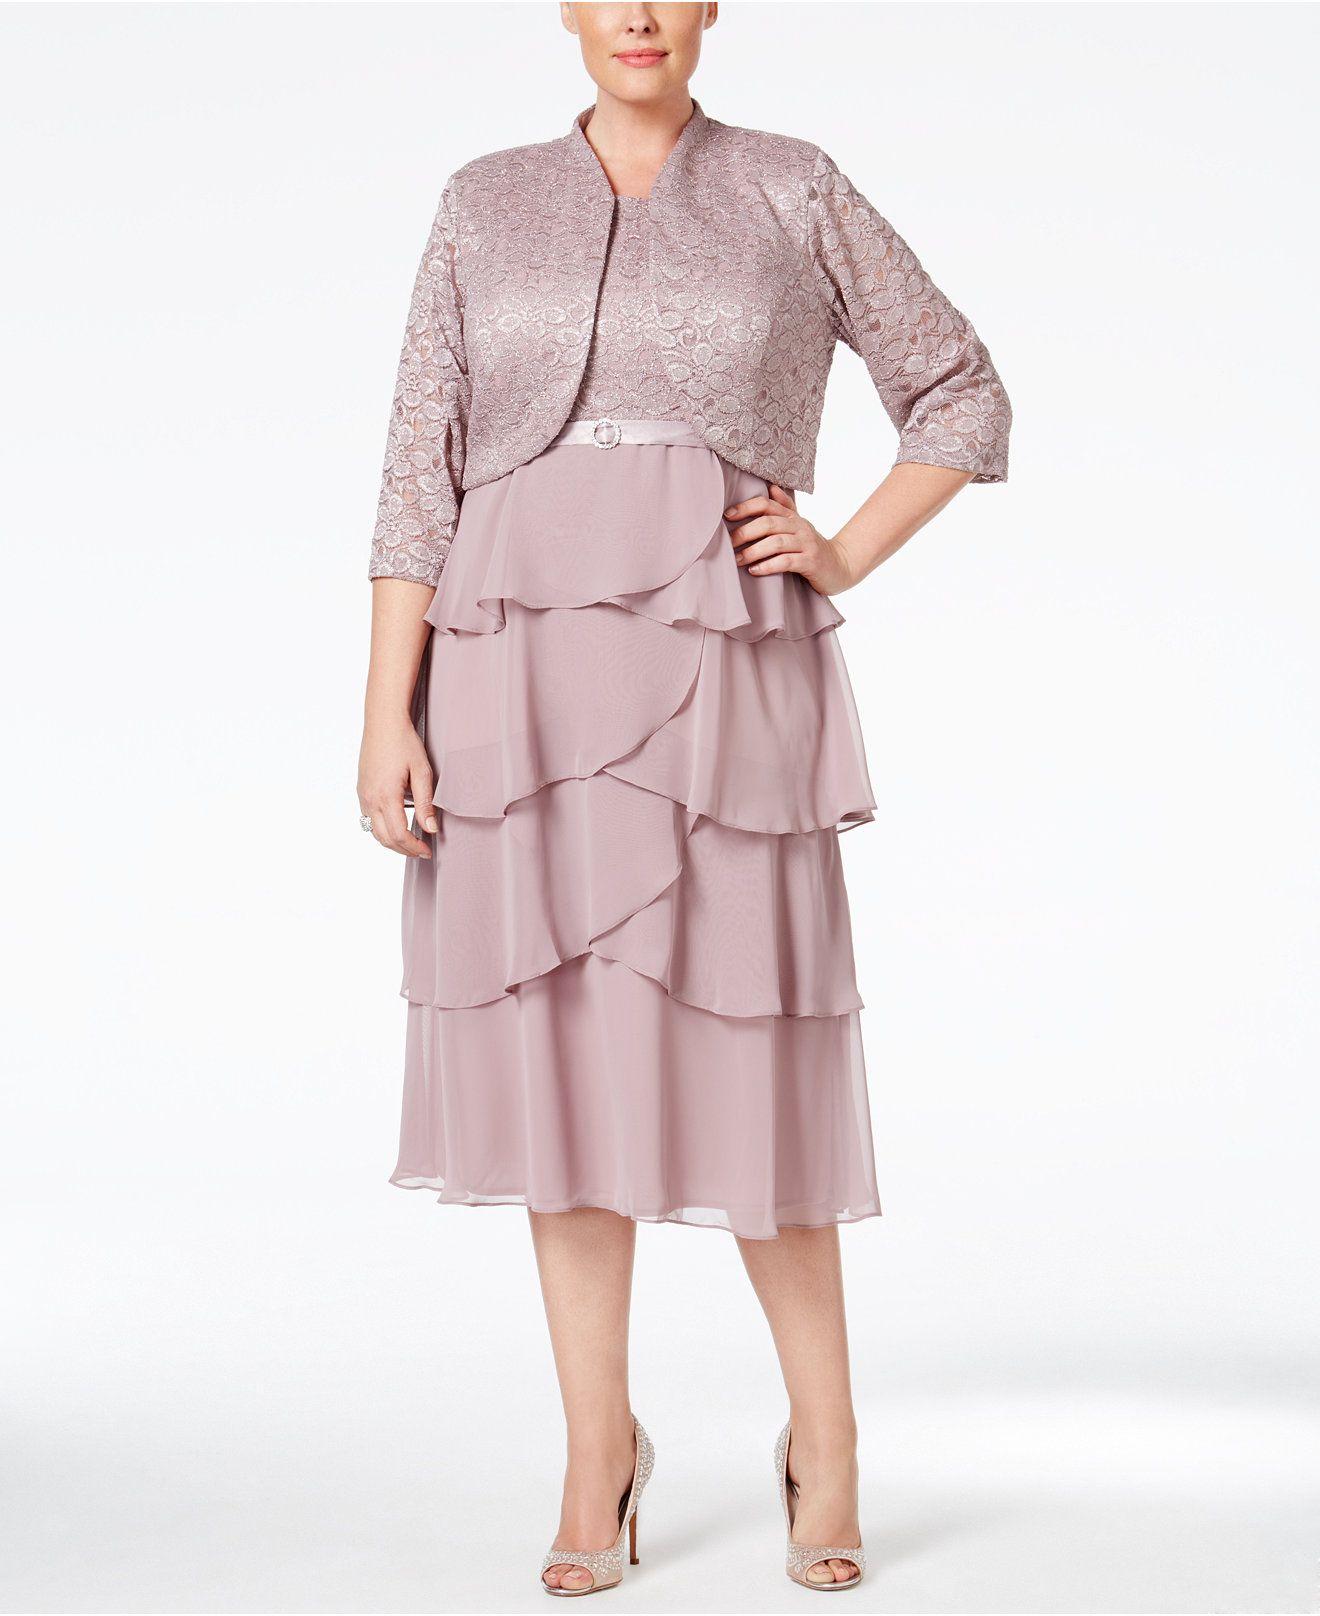 Macys womens dresses wedding  R u M Richards Plus Size Lace Tiered Dress and Jacket  Dresses